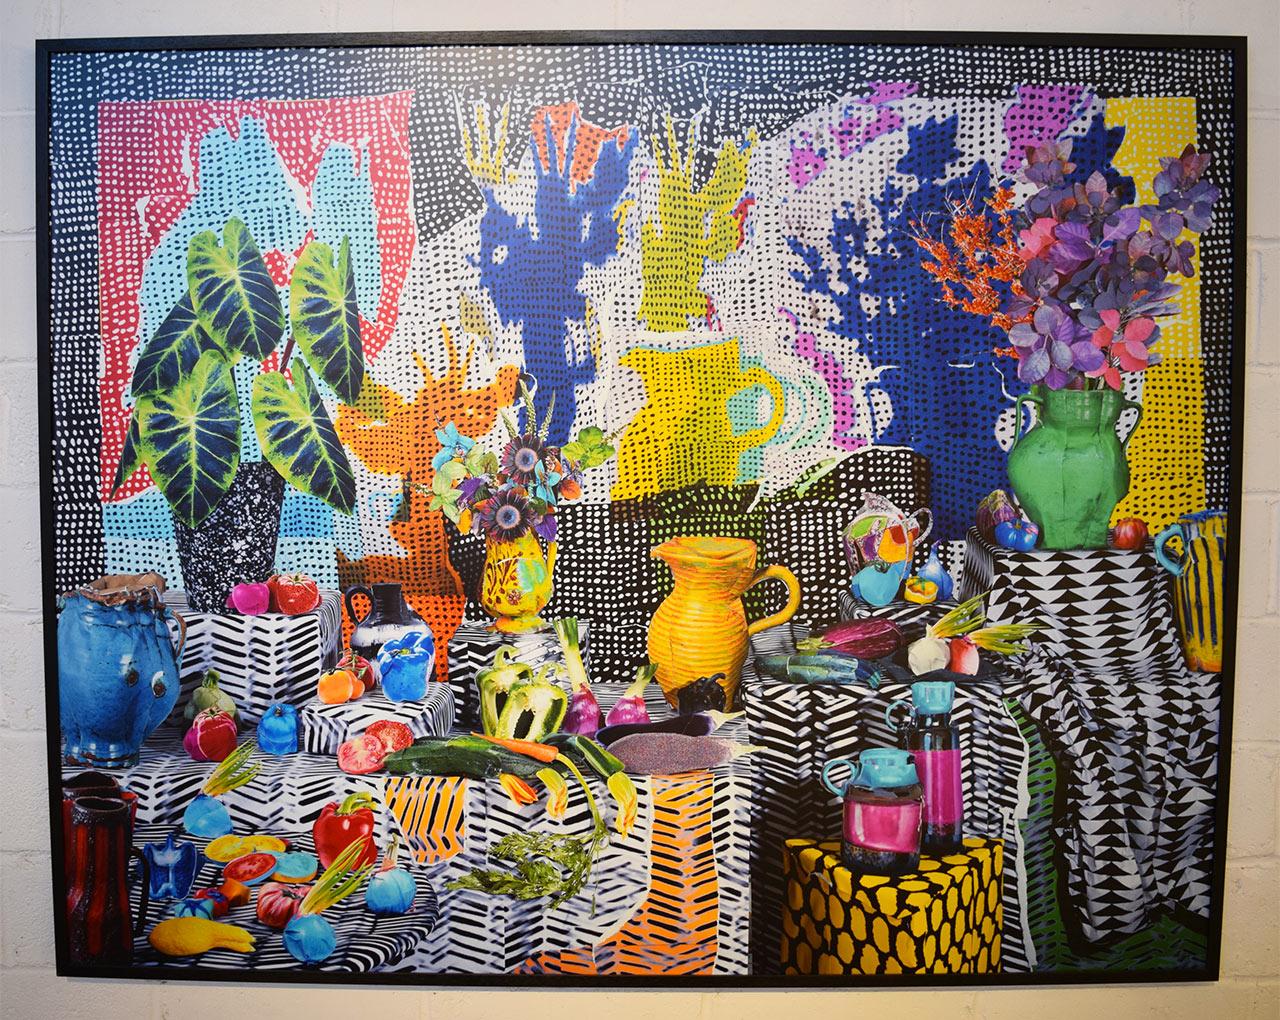 "Daniel Gordon, ""Ratatouille and Smoke Bush"" (2013) at Pioneer Works"